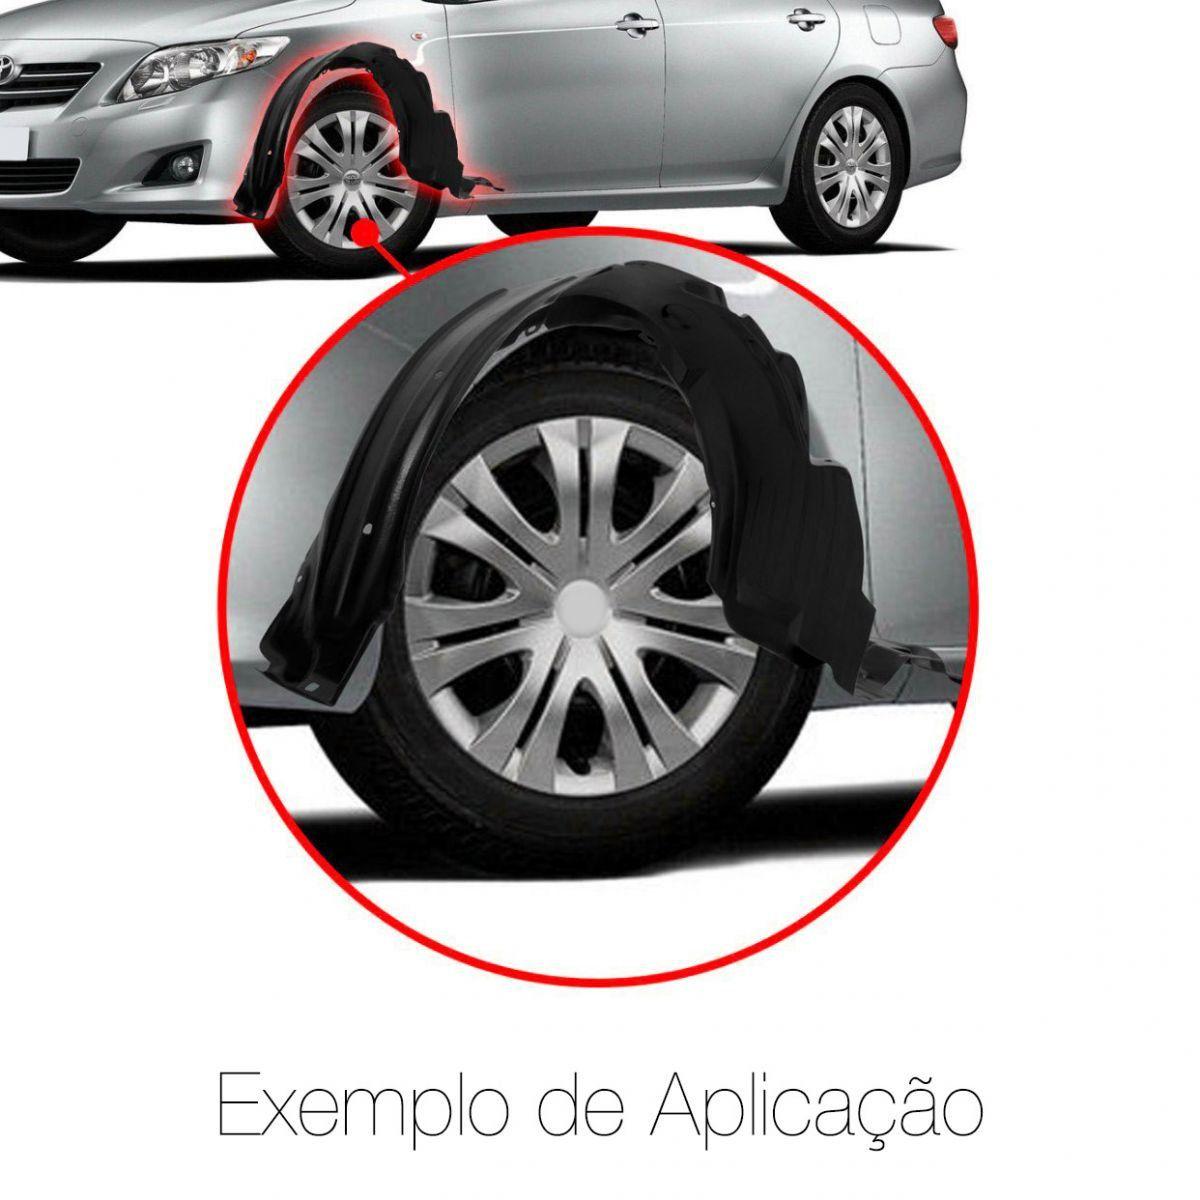 Parabarro Corolla 2002 2003 2004 2005 2006 2007 2008